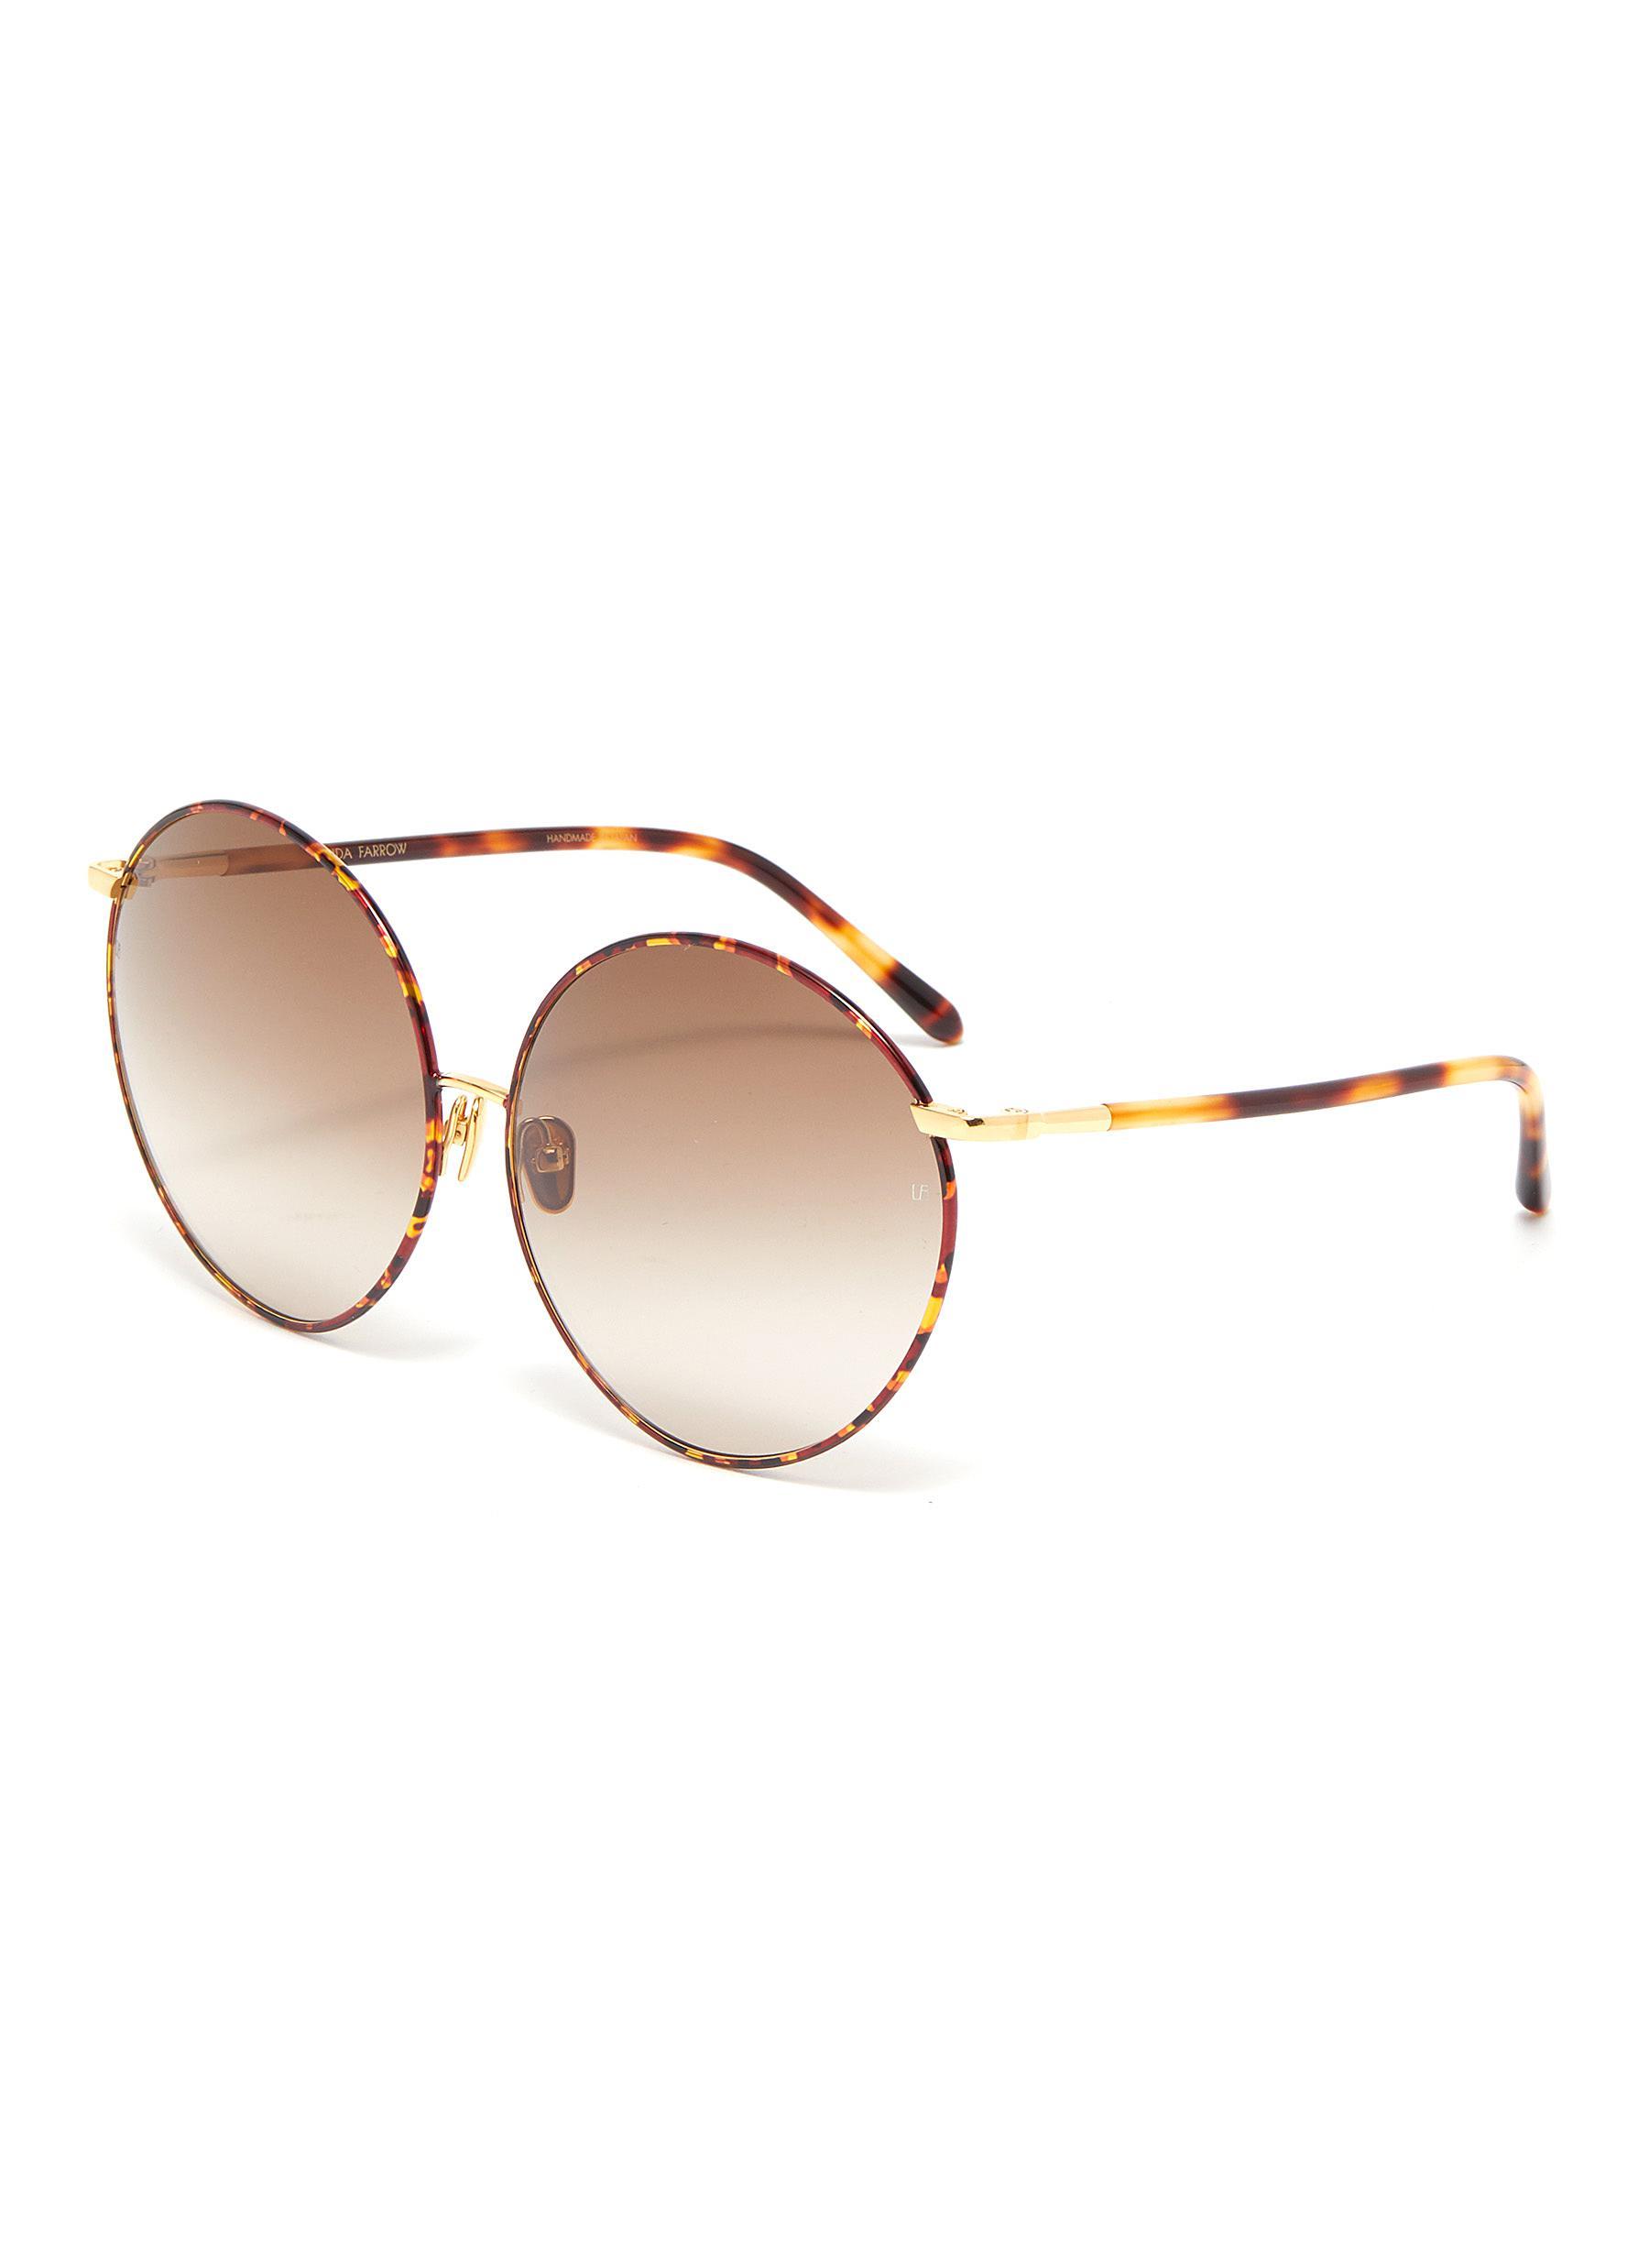 Linda Farrow Metal Bridge Tortoiseshell Acetate Oversized Round Sunglasses In Brown